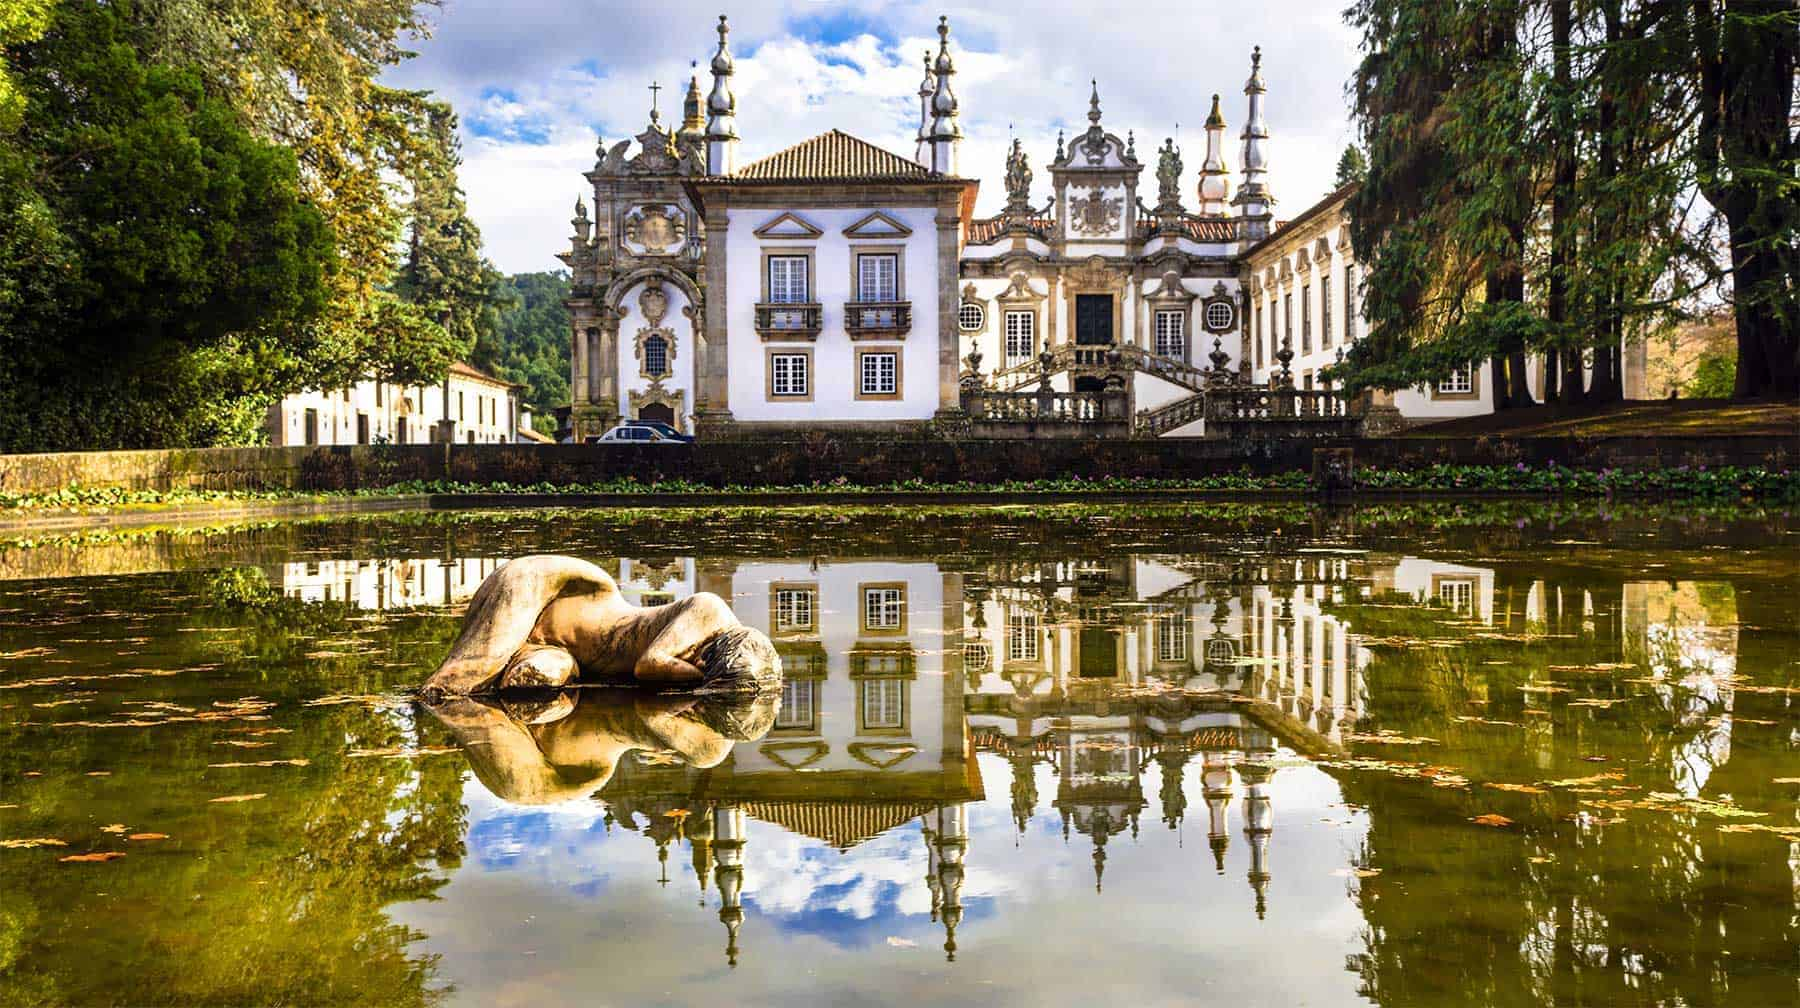 Castle in Portugal